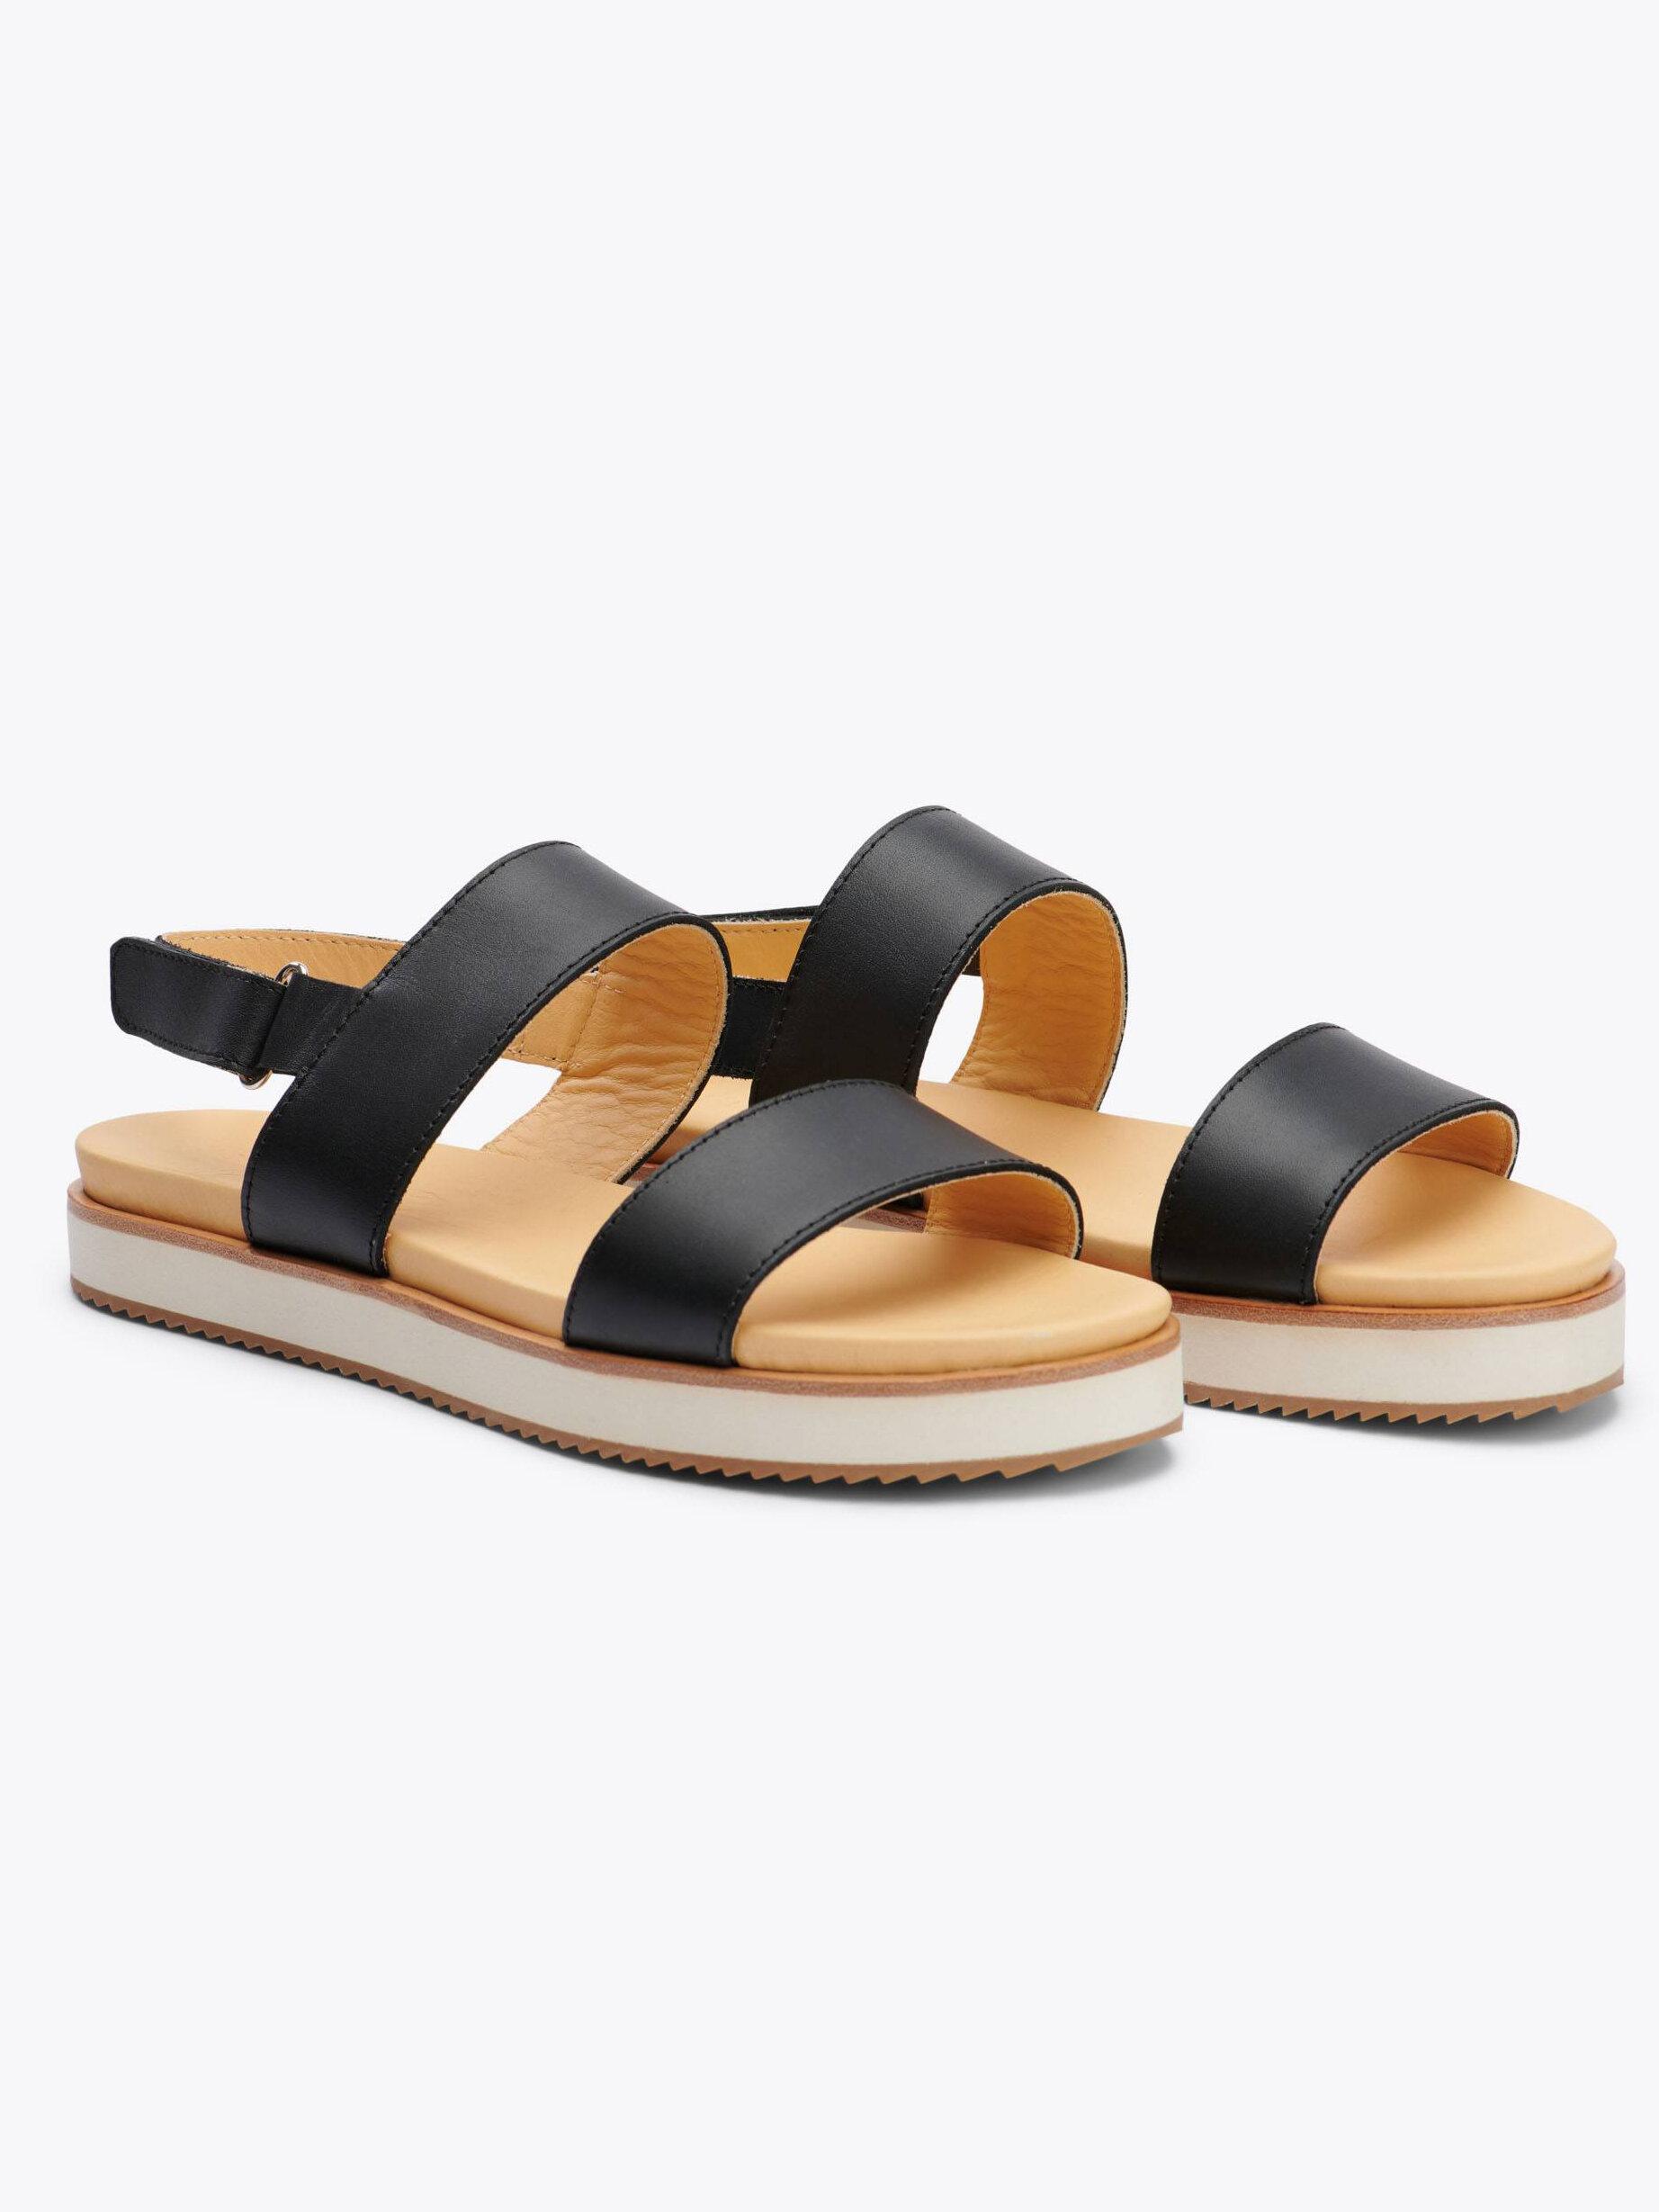 19 Nisolo-sandals-spring-capsule-wardrobe.jpeg